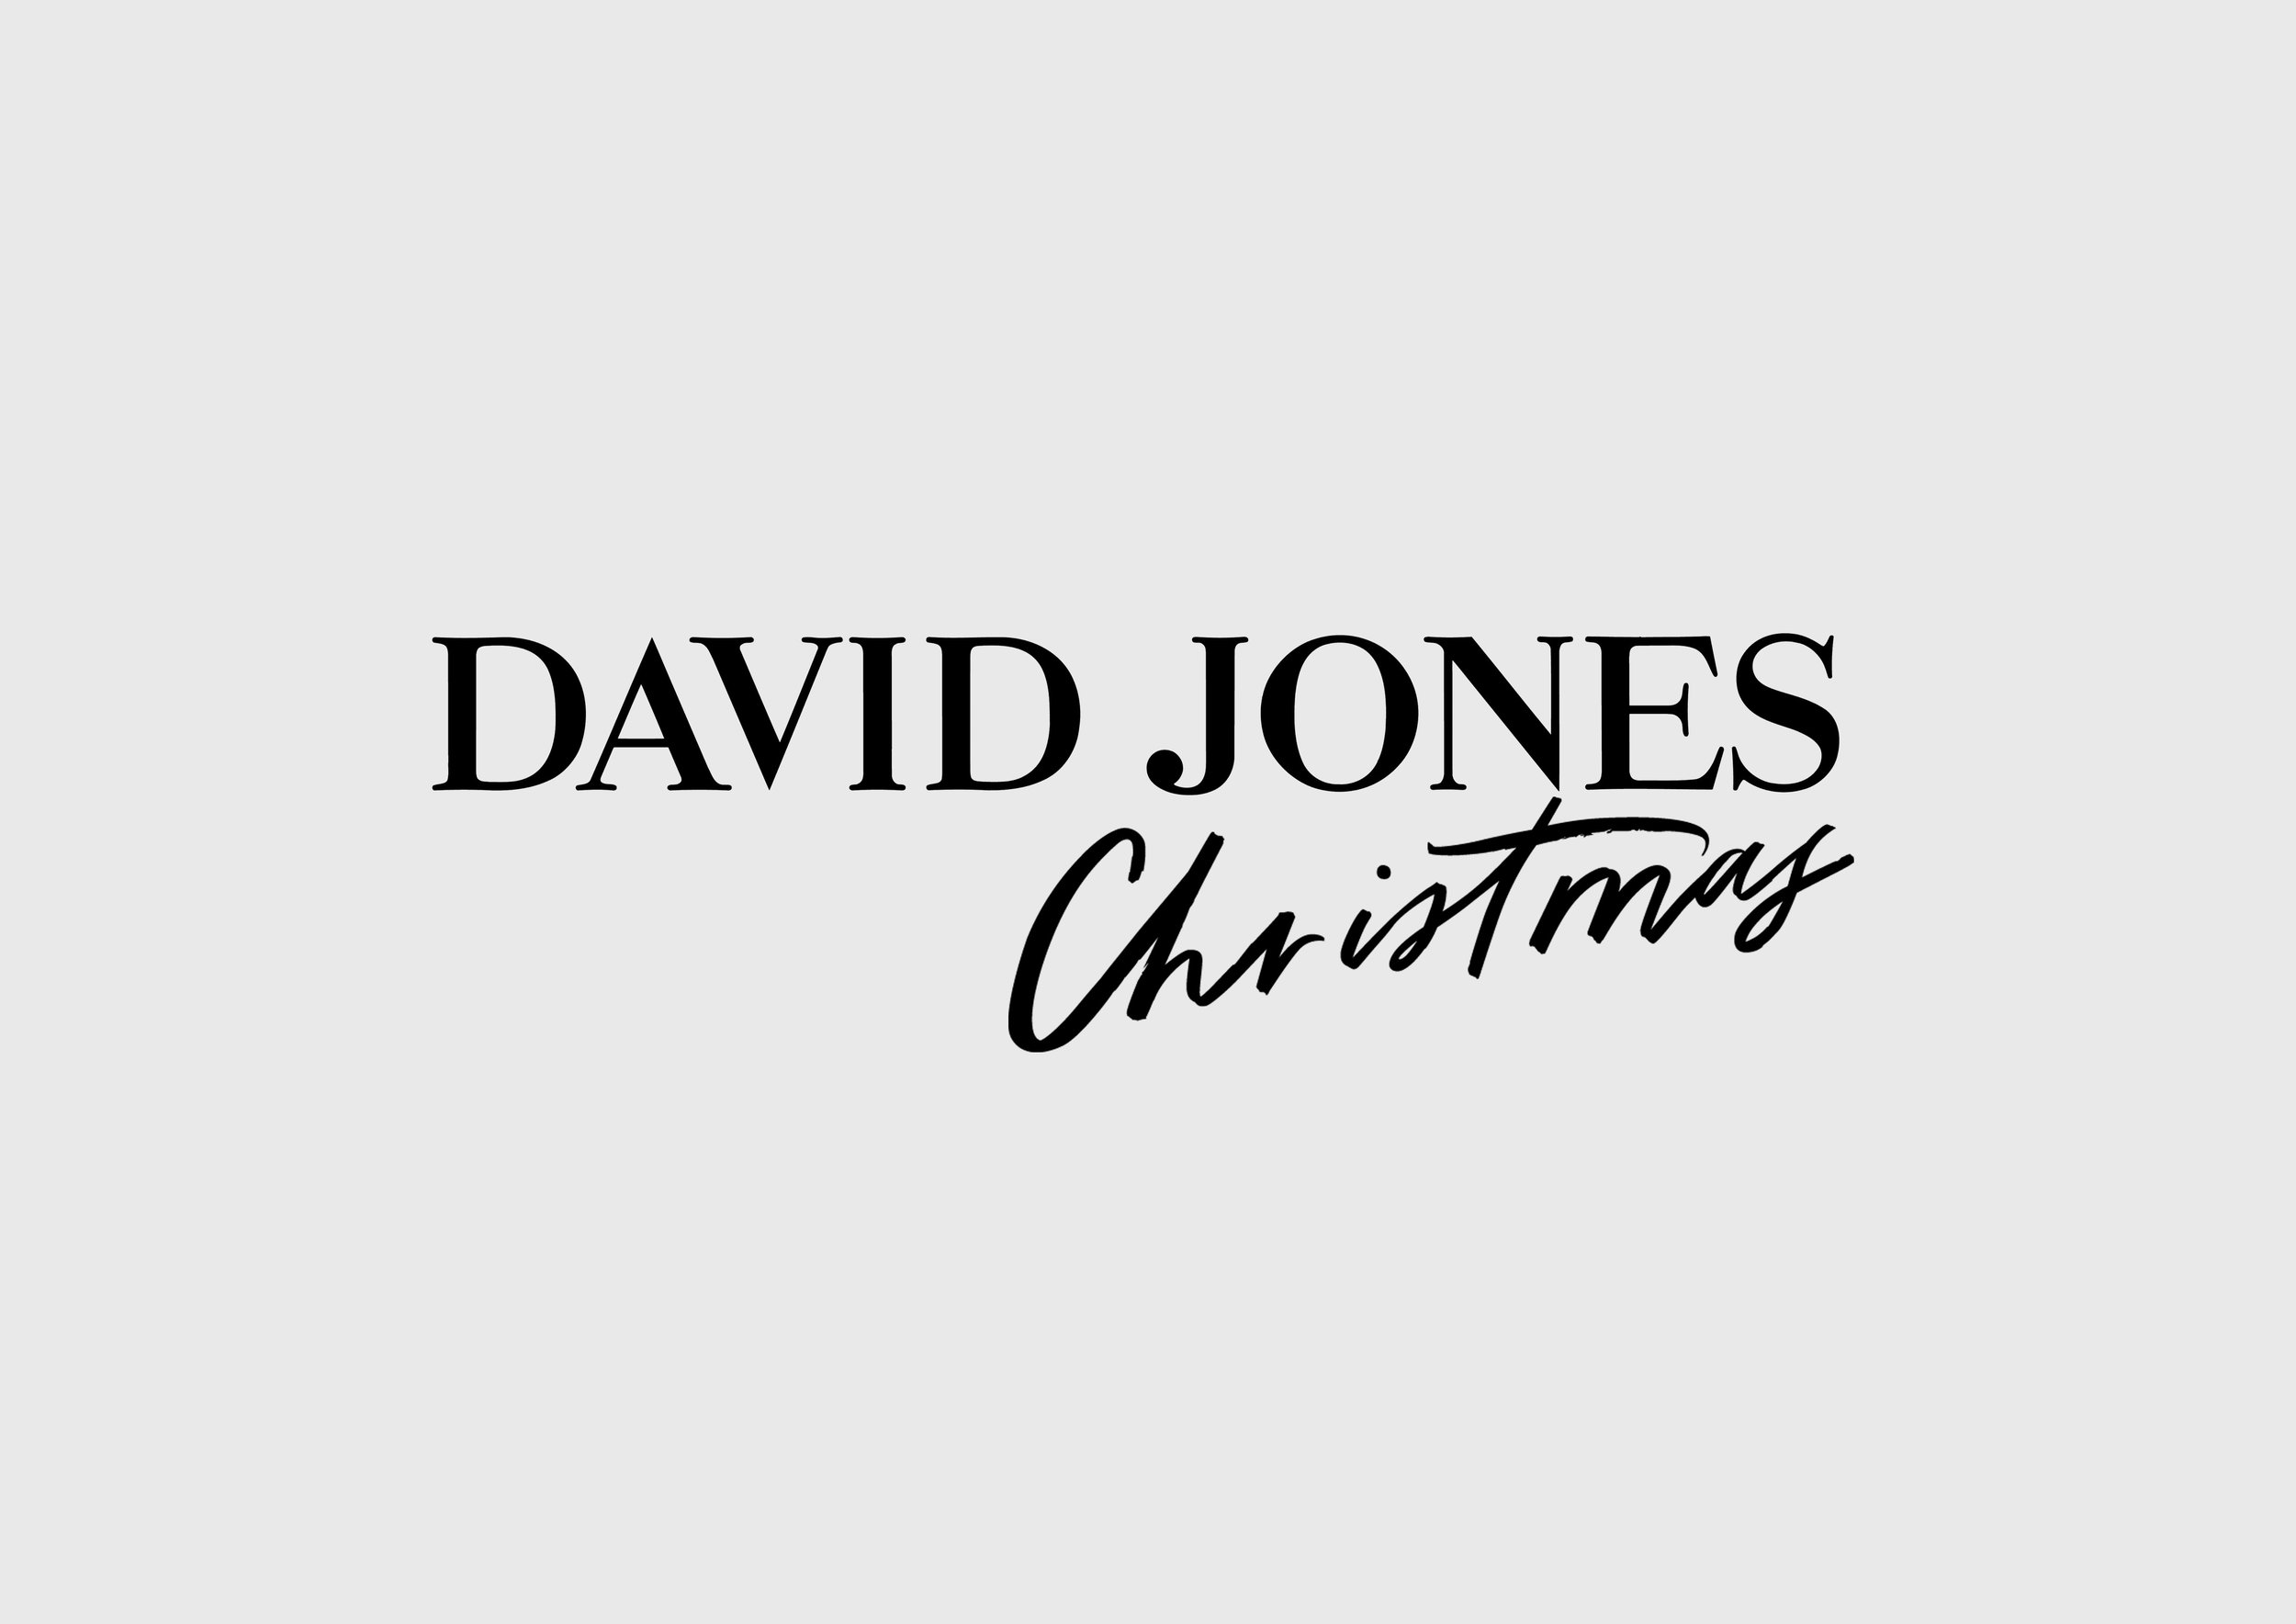 David Jones Christmas Campaign Lettering  2015/2016